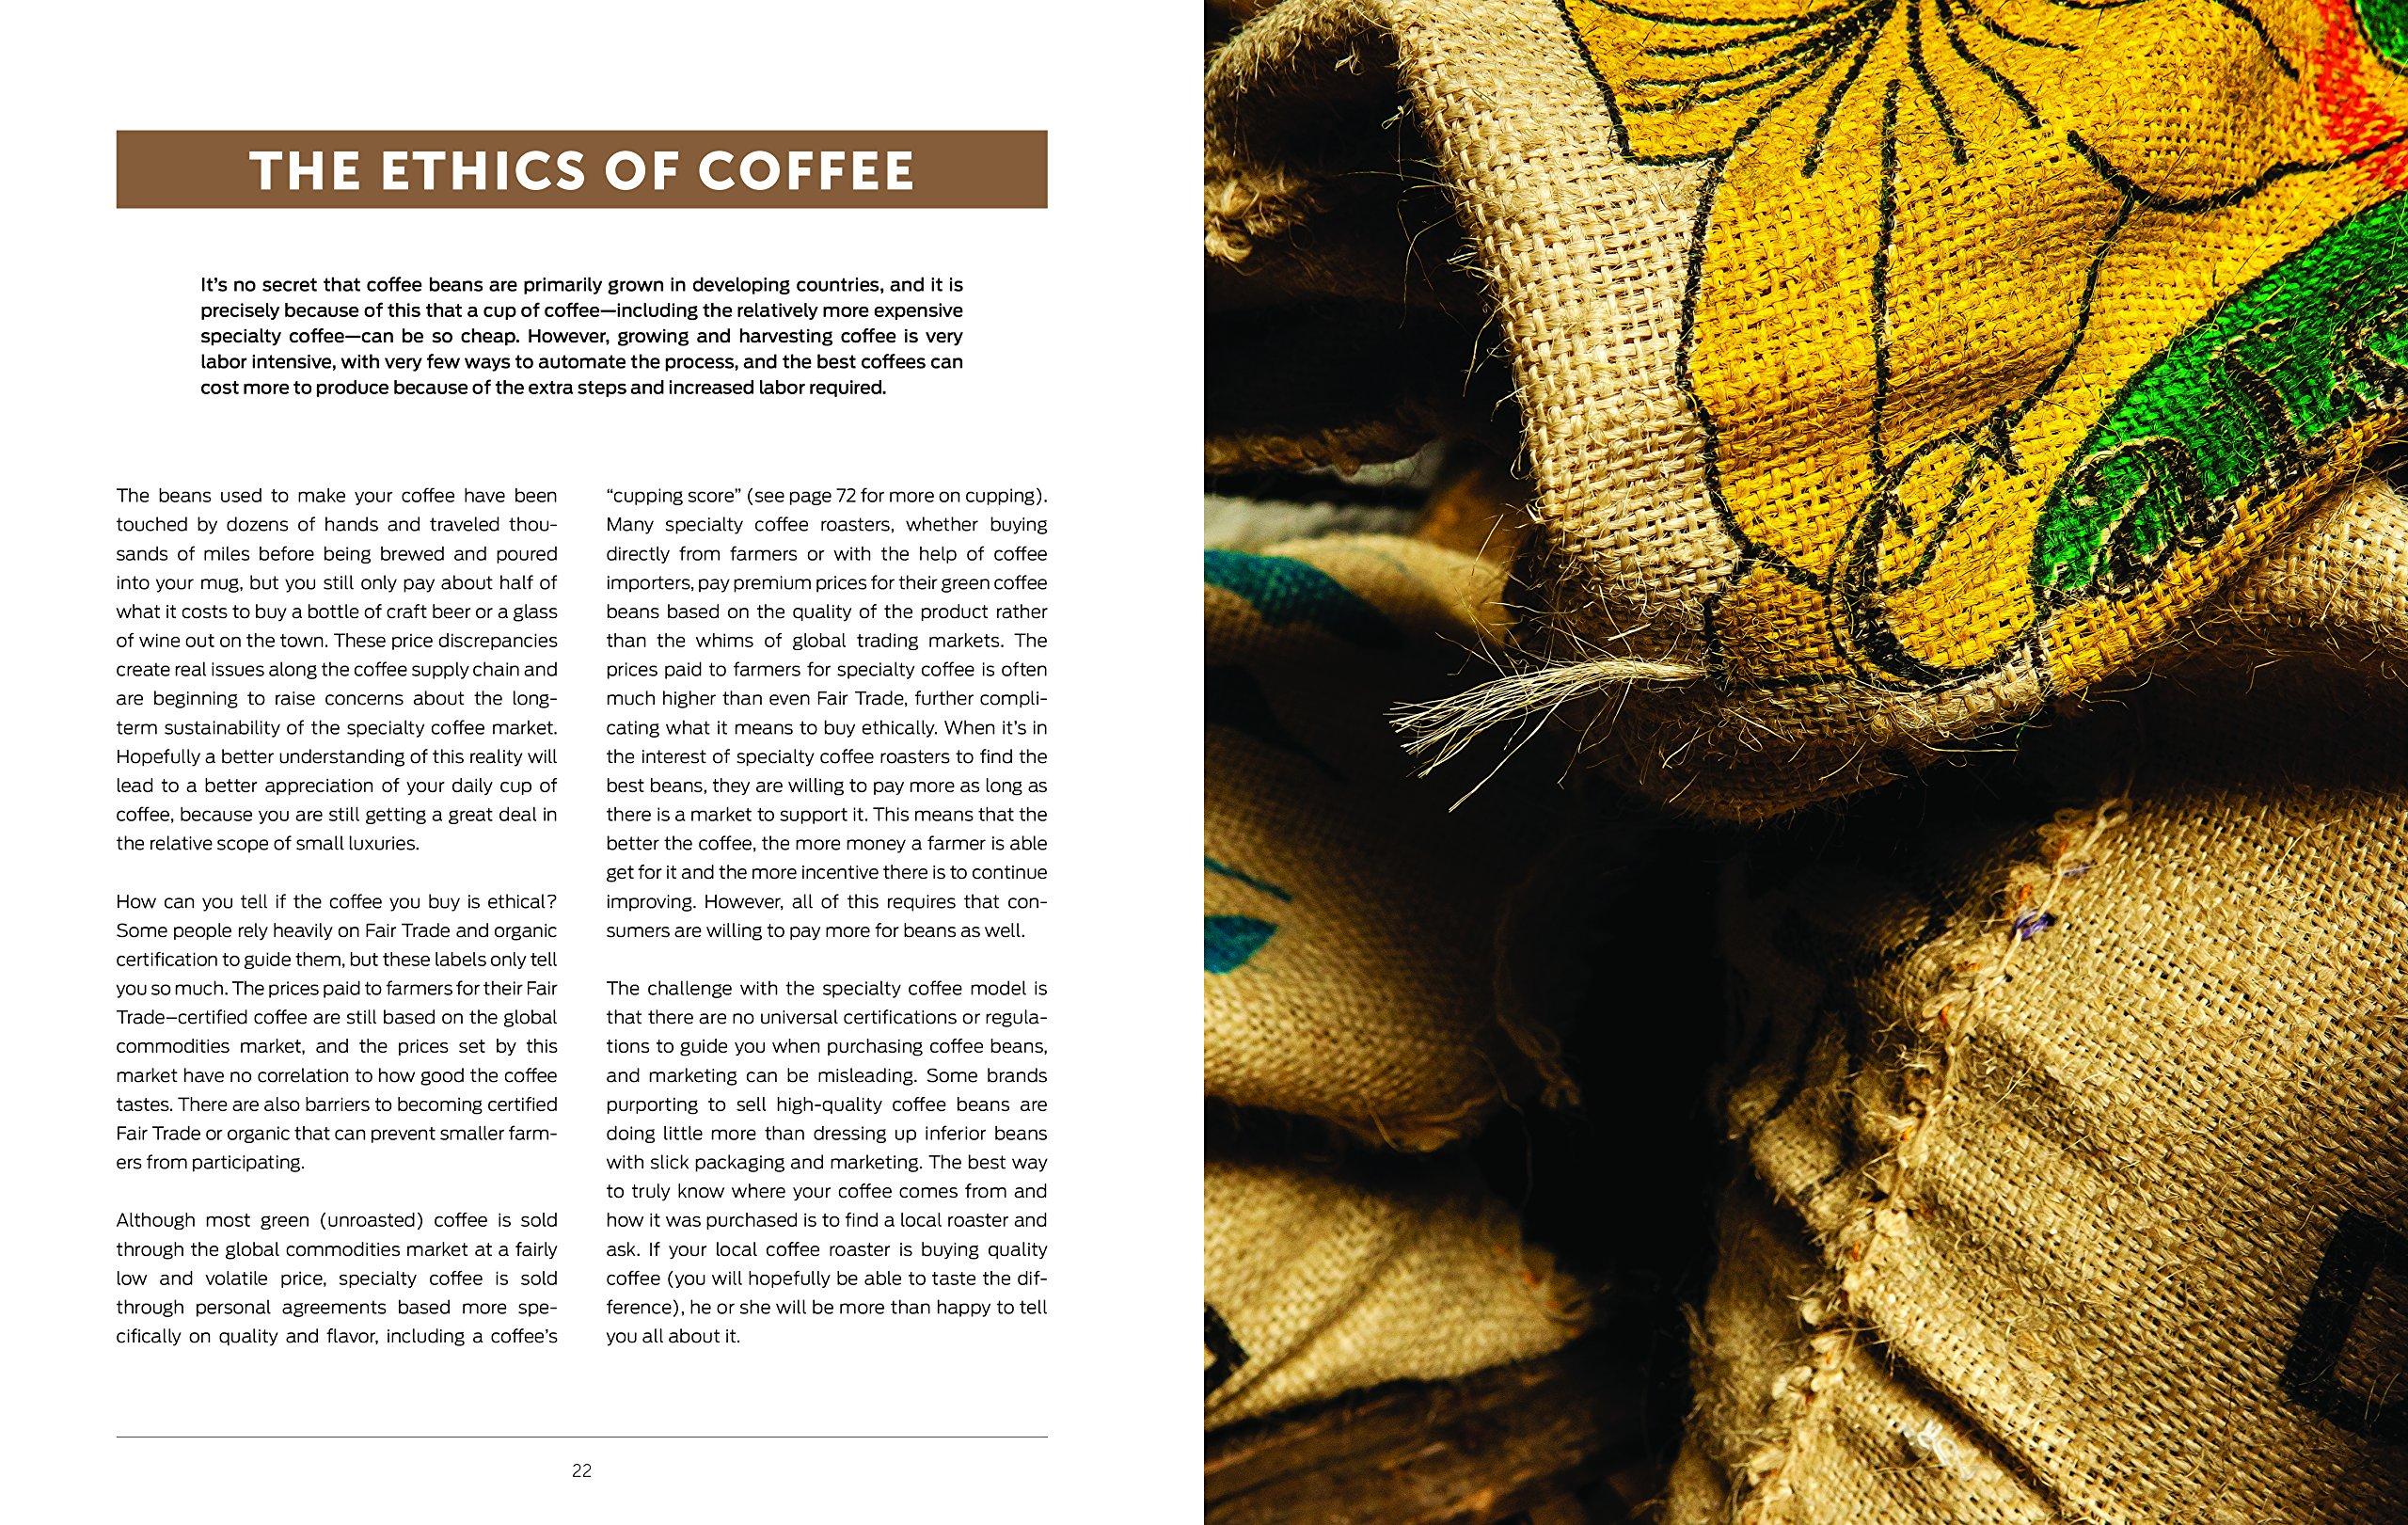 Brew better coffee at home brian w jones 9780989888226 amazon brew better coffee at home brian w jones 9780989888226 amazon books xflitez Gallery